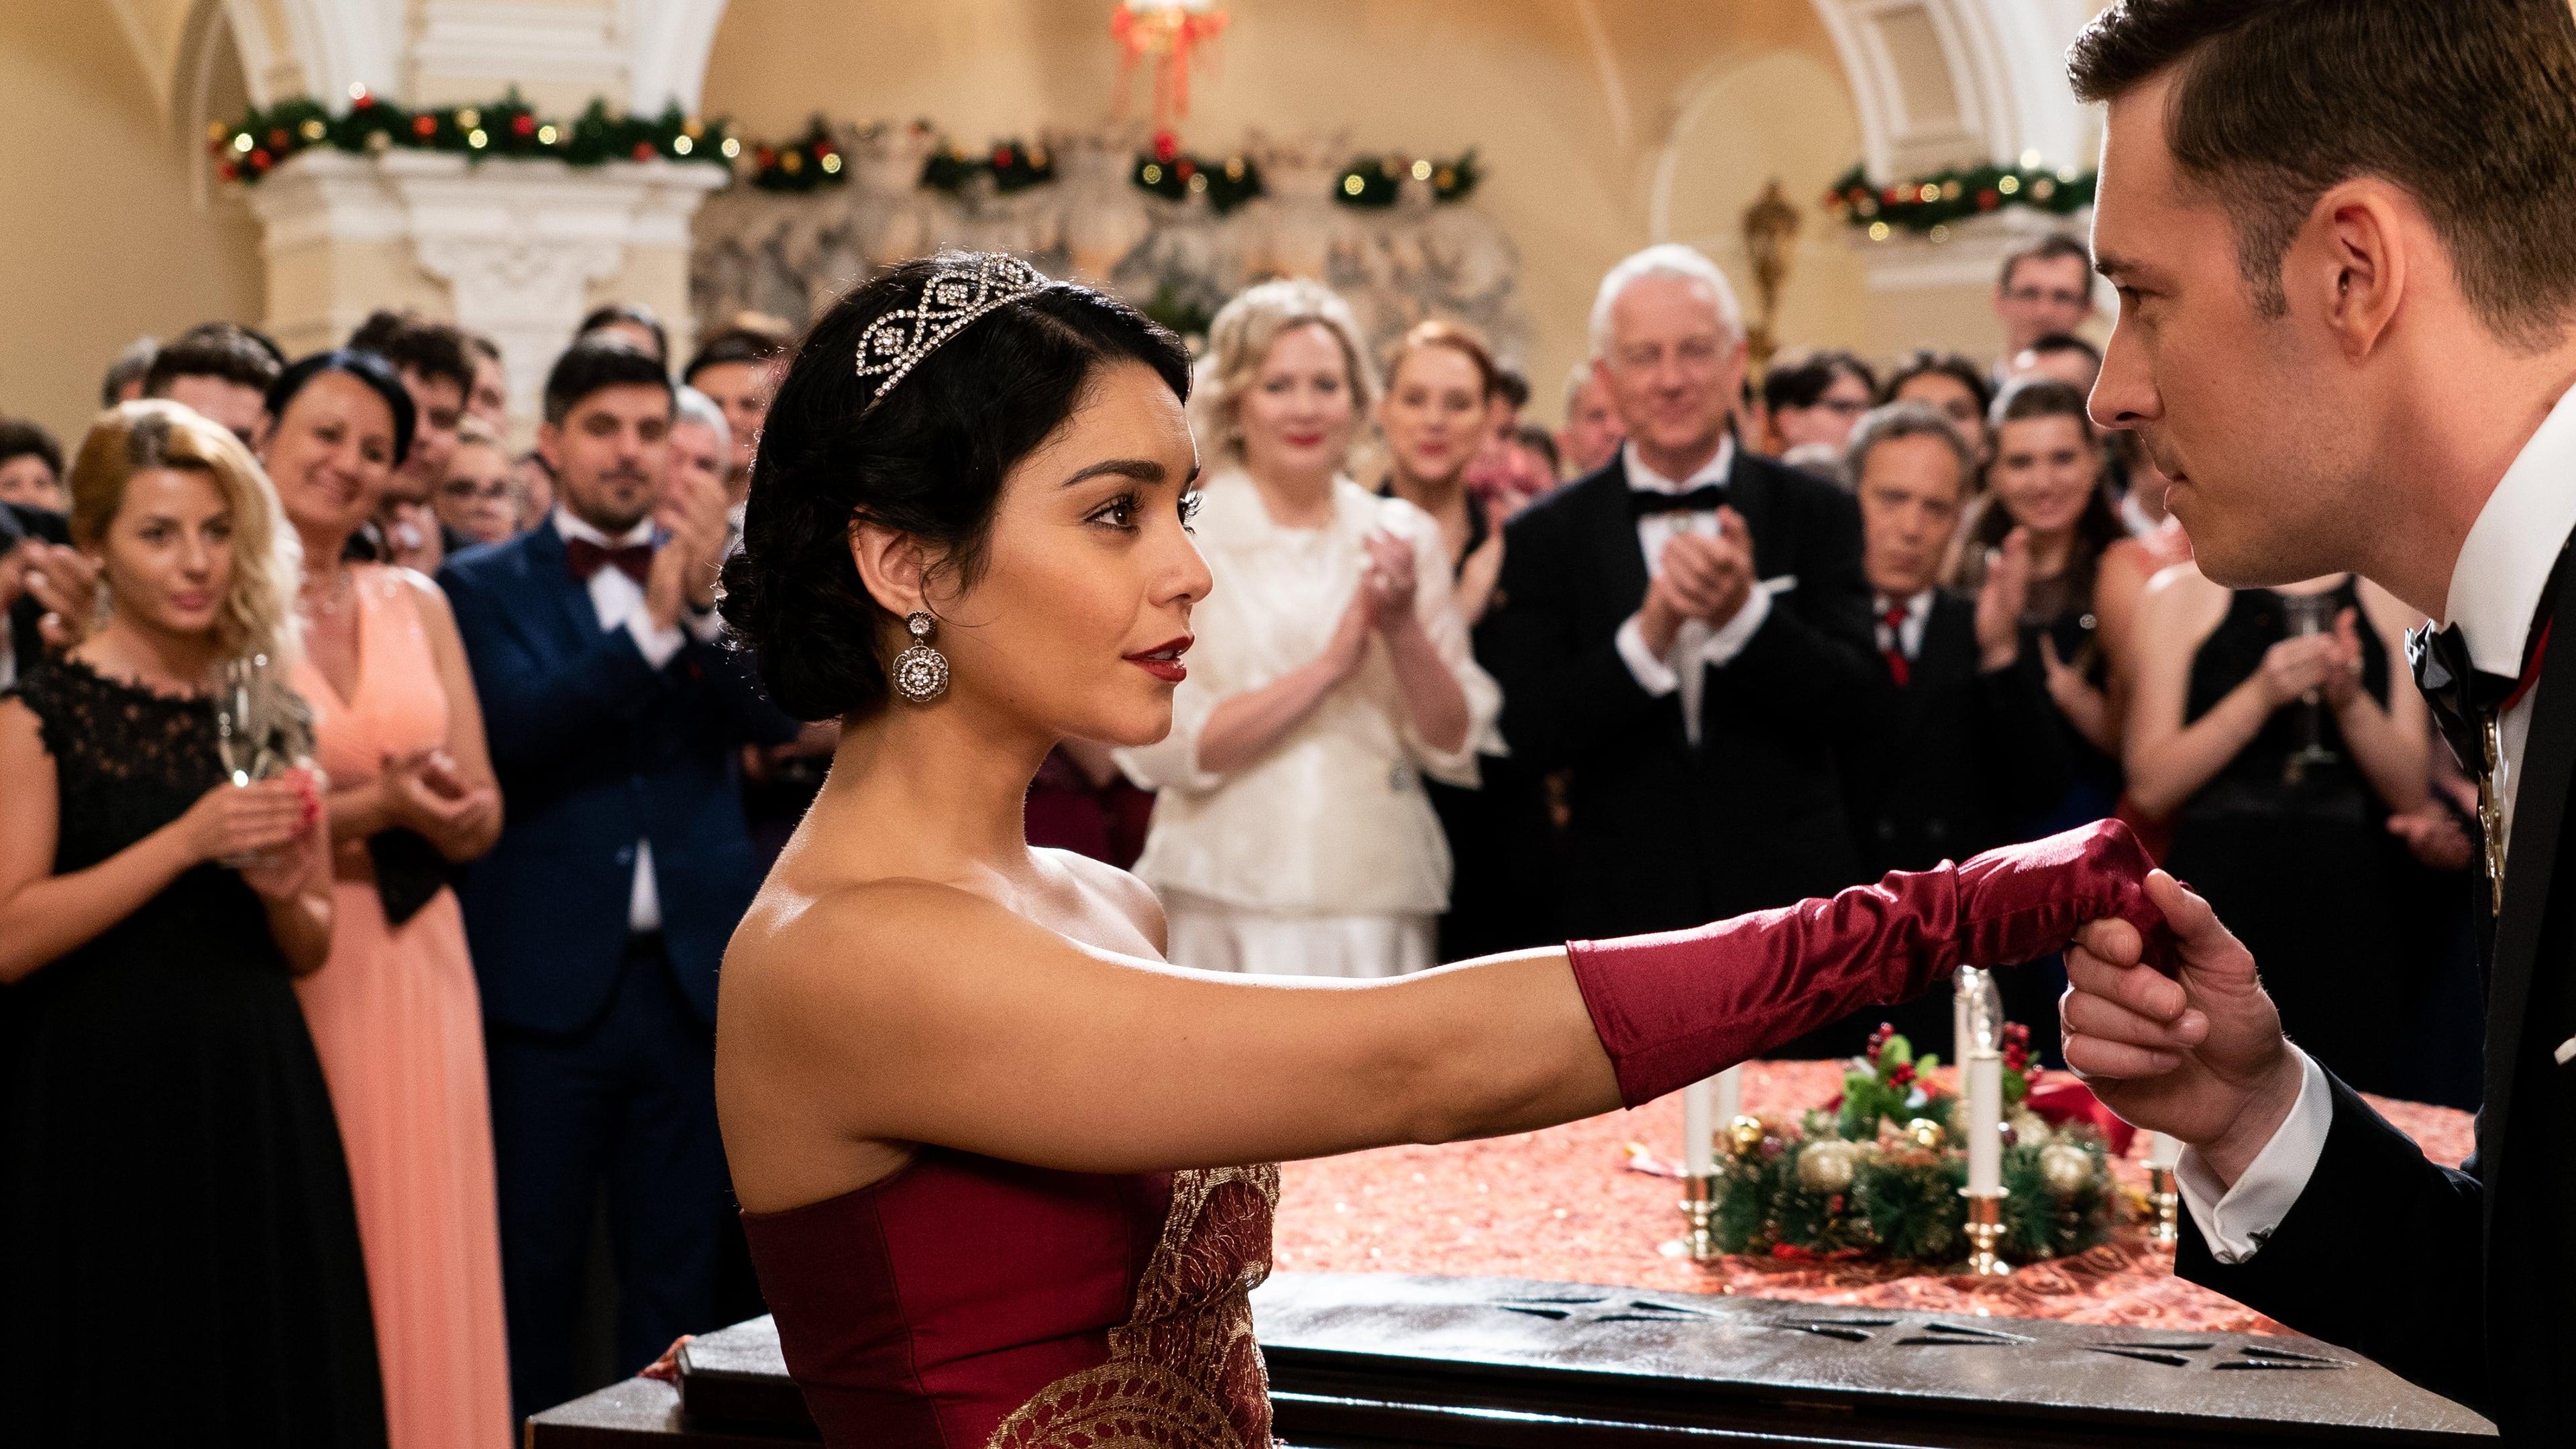 DESCARGAR Cambio de princesa (2018) pelicula completa en español latino